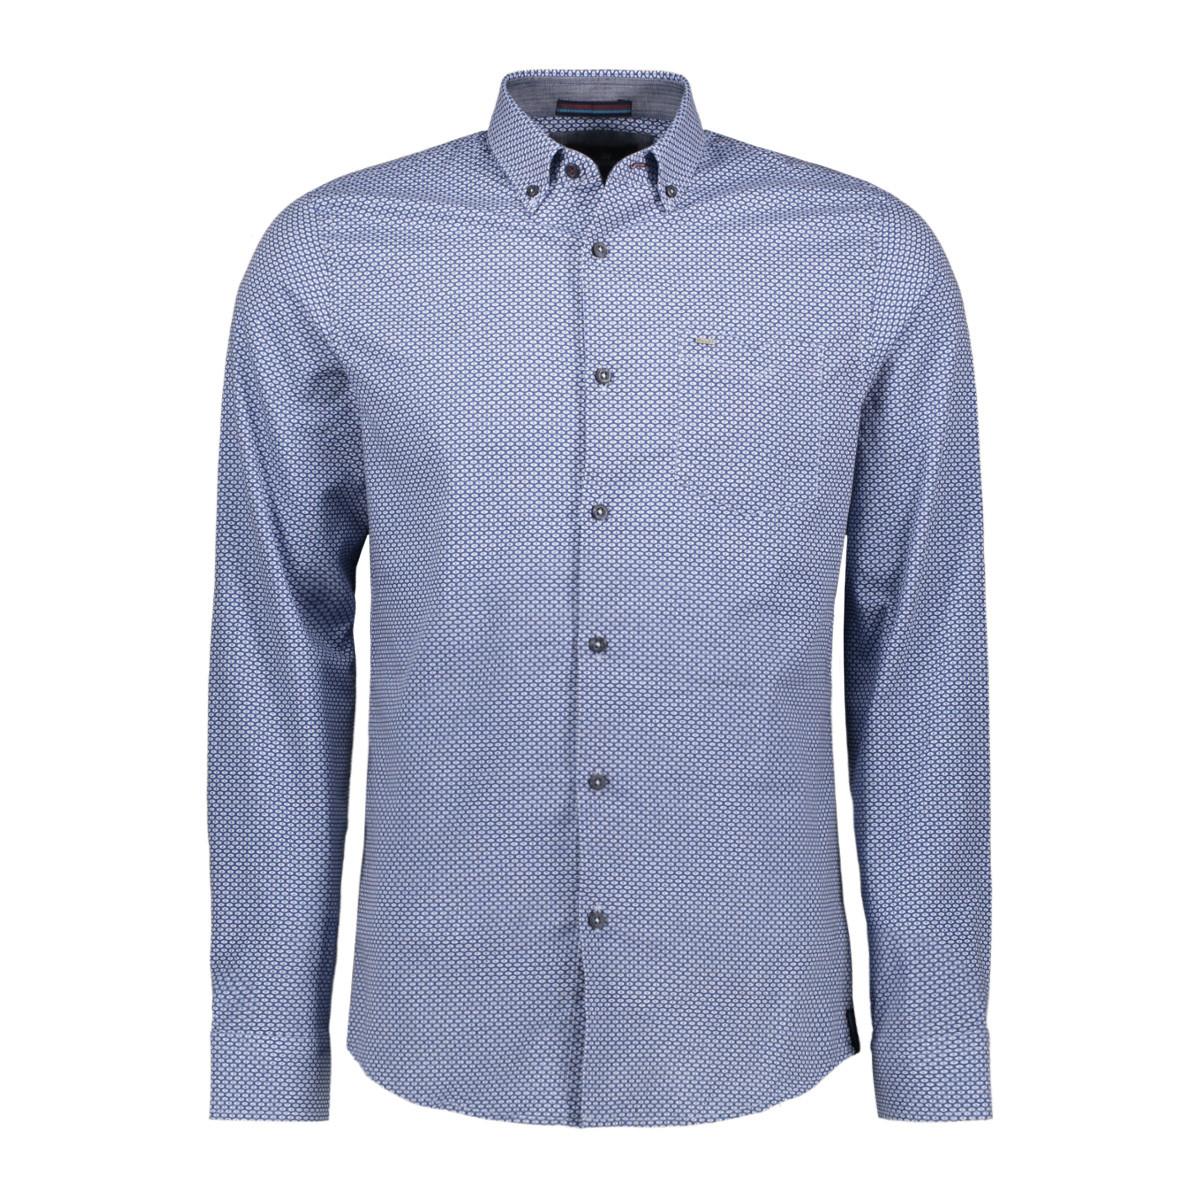 Blauw heren overhemd Vanguard - VSI195402-5331